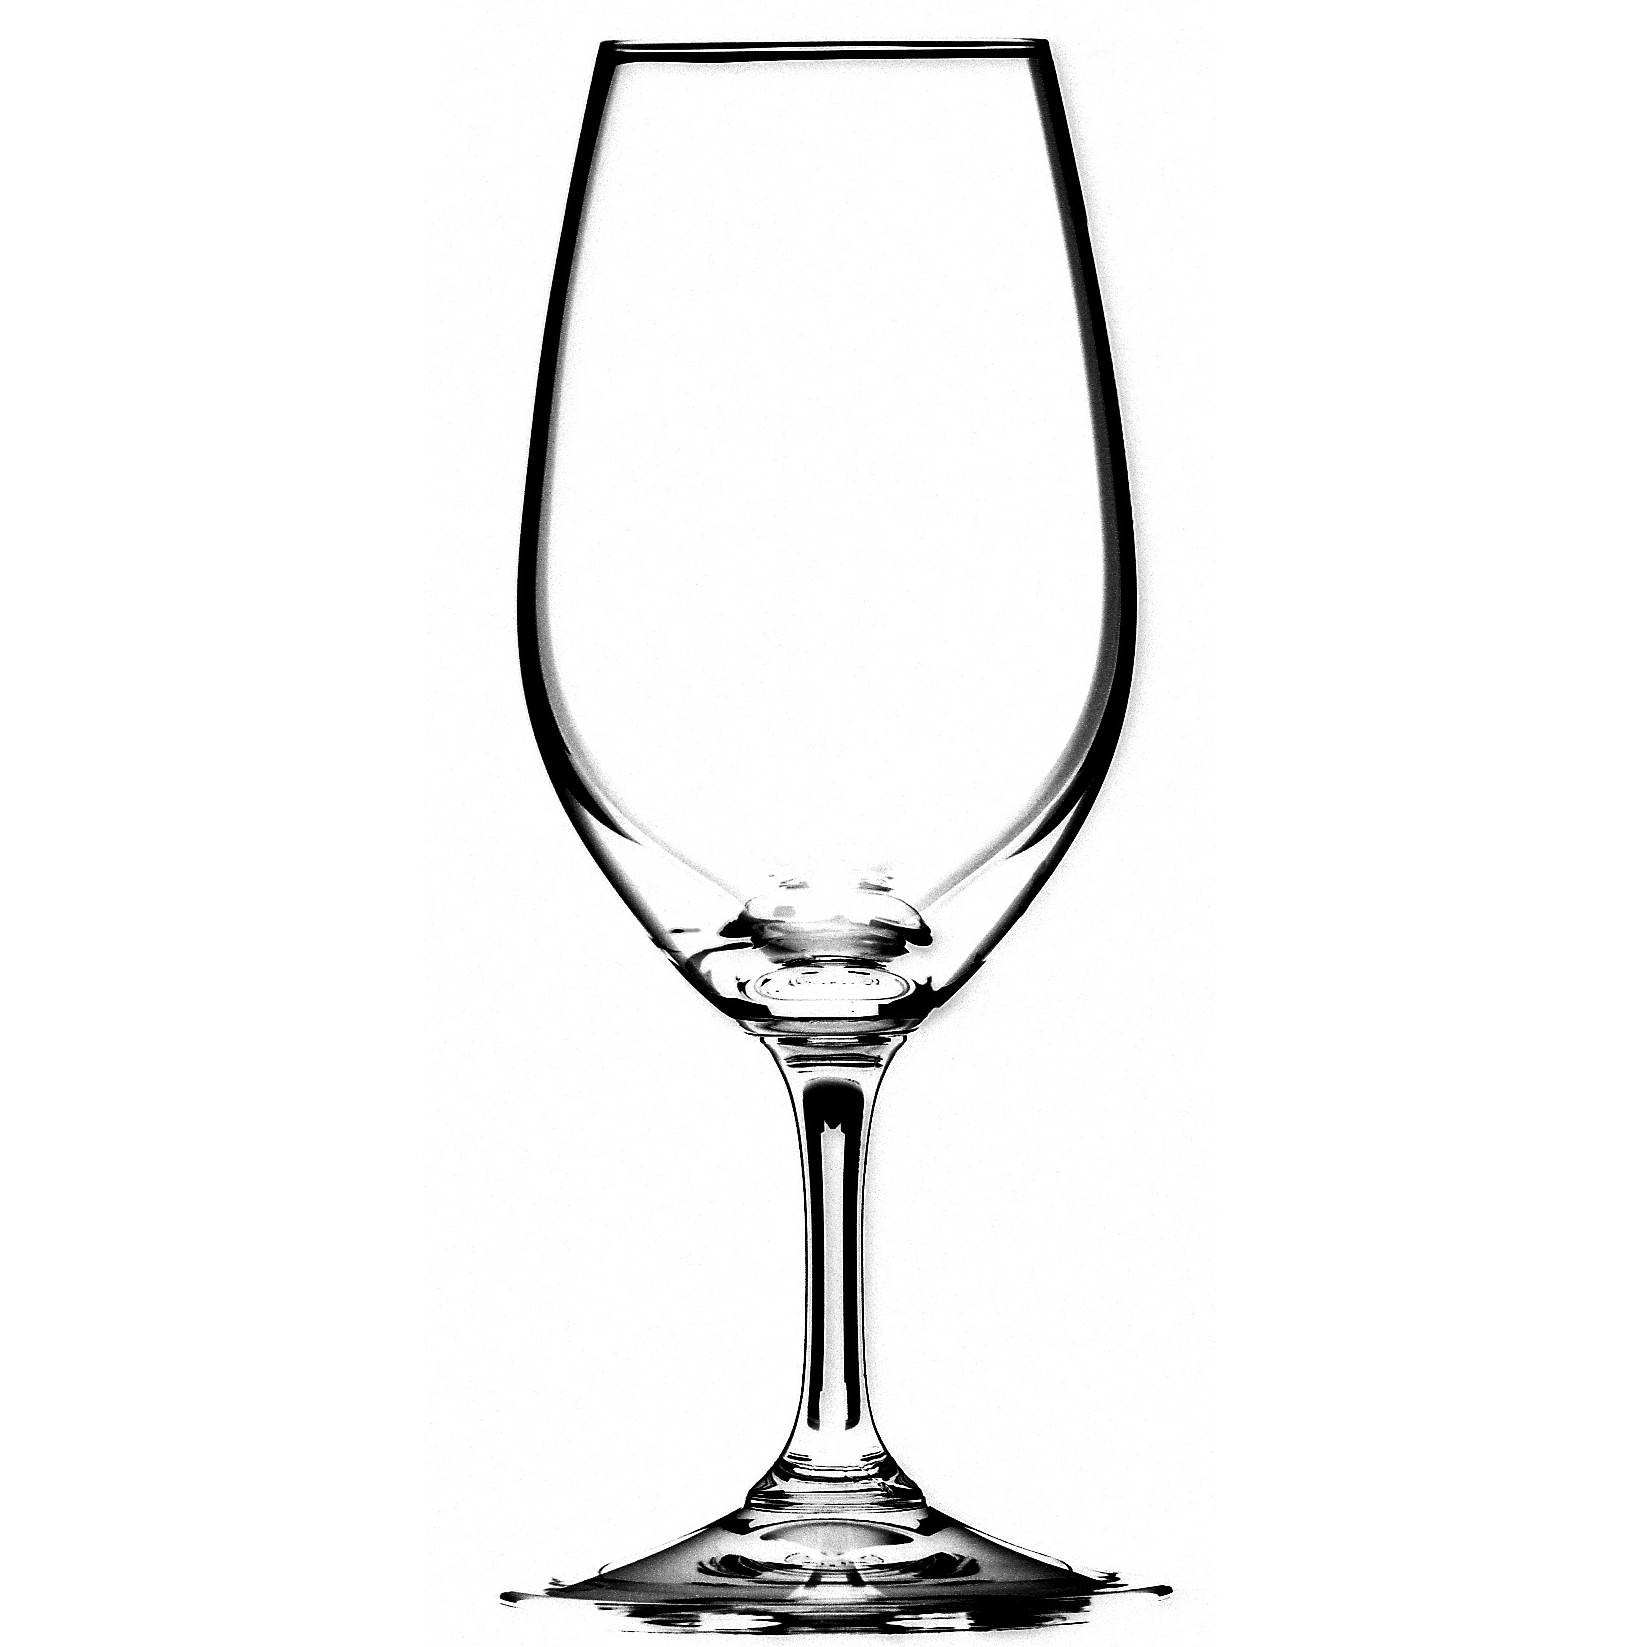 Riedel Vinum Leaded Crystal Port Wine Glass, Set of 2